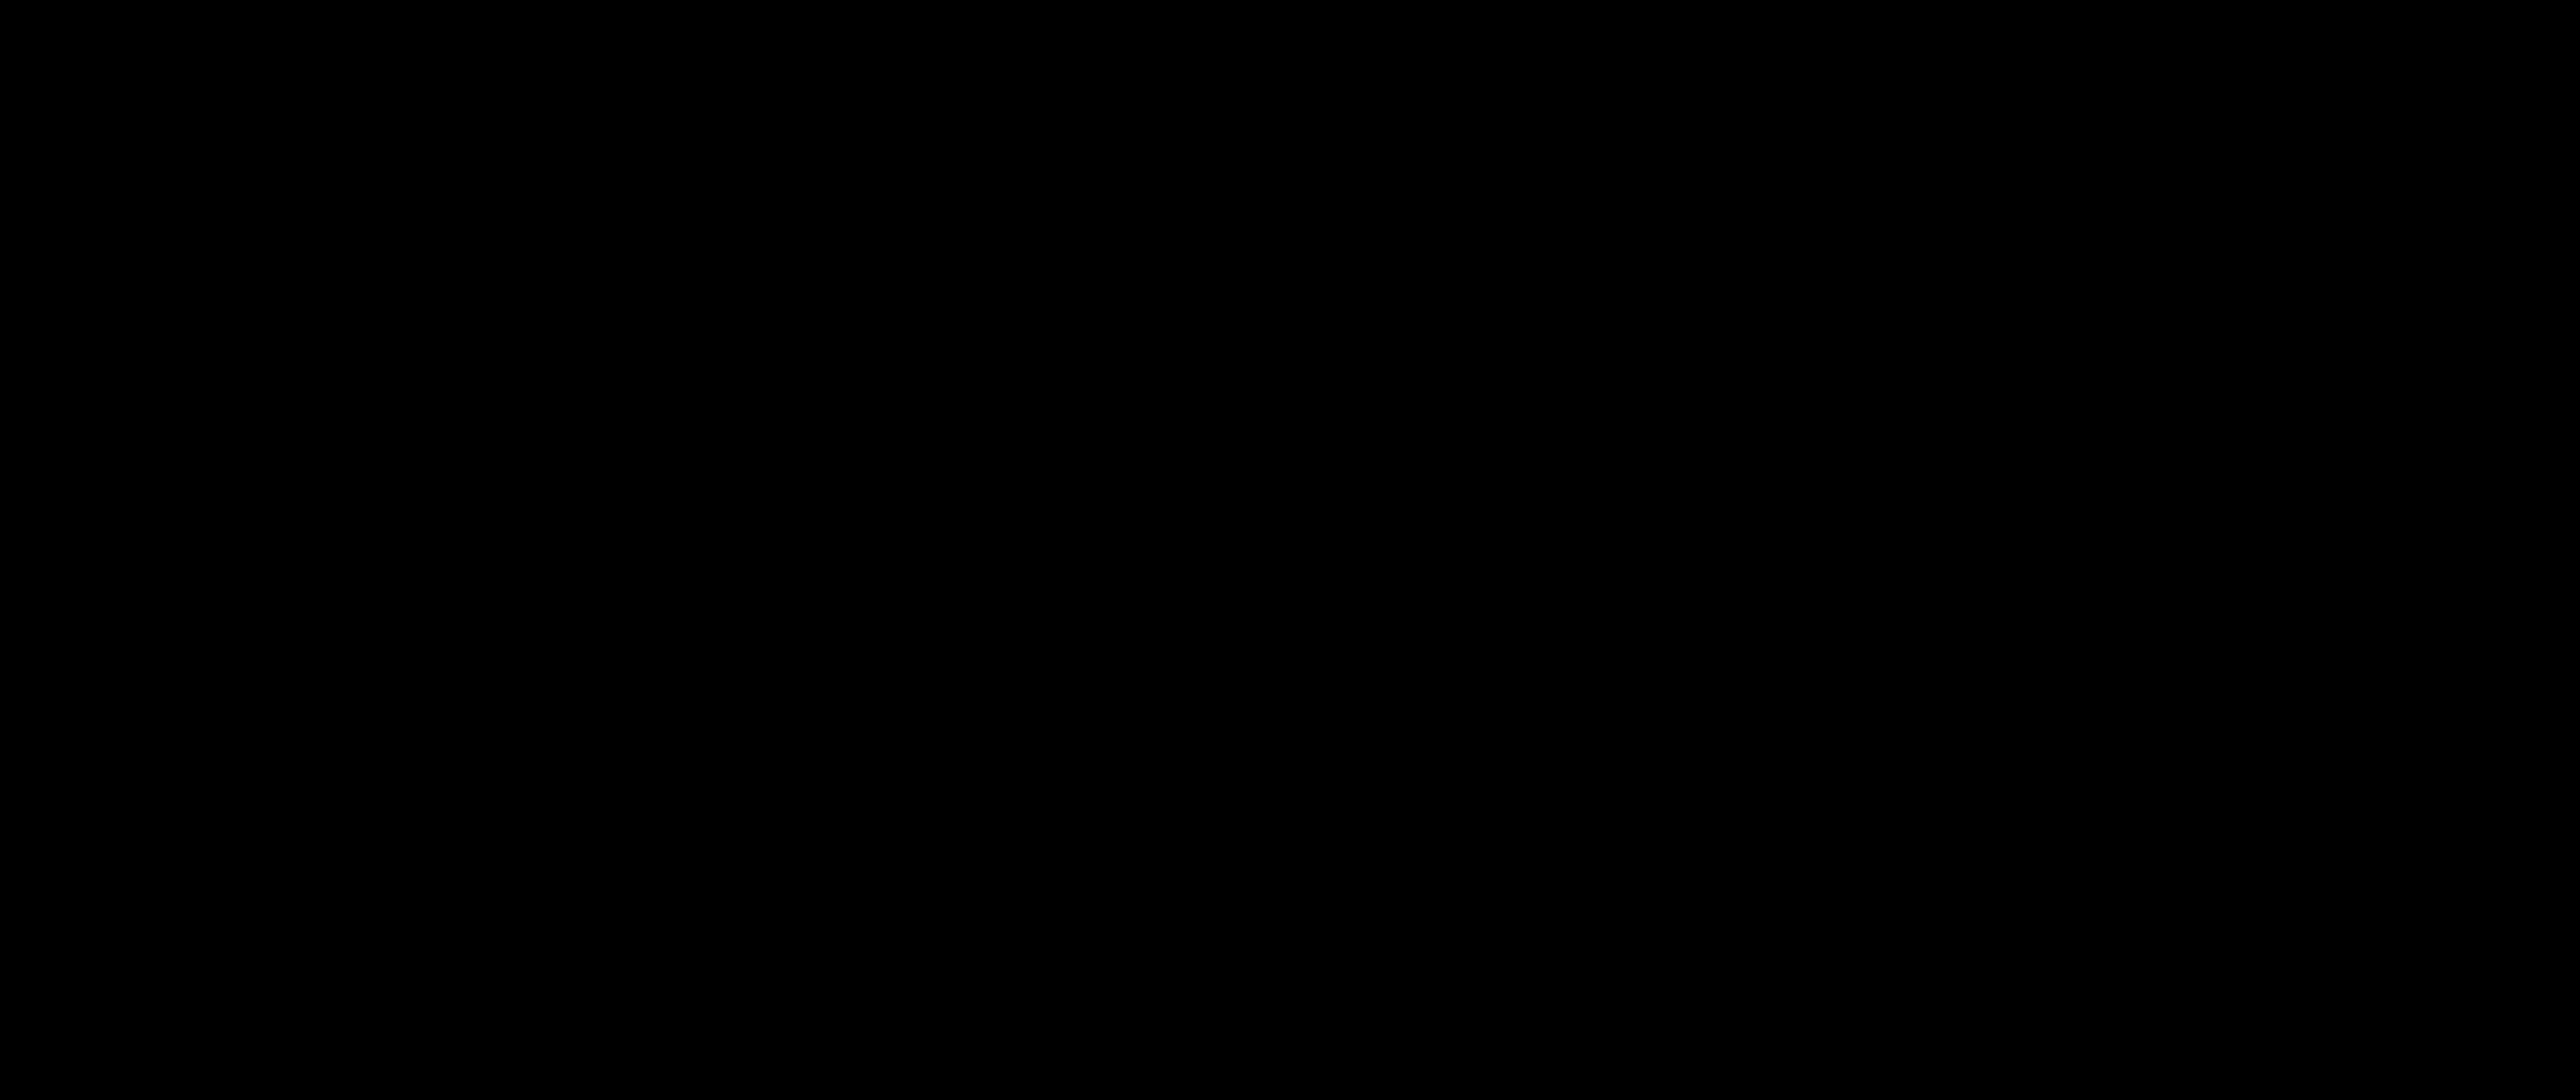 Logo The Walt Disney Company Brand Symbol.